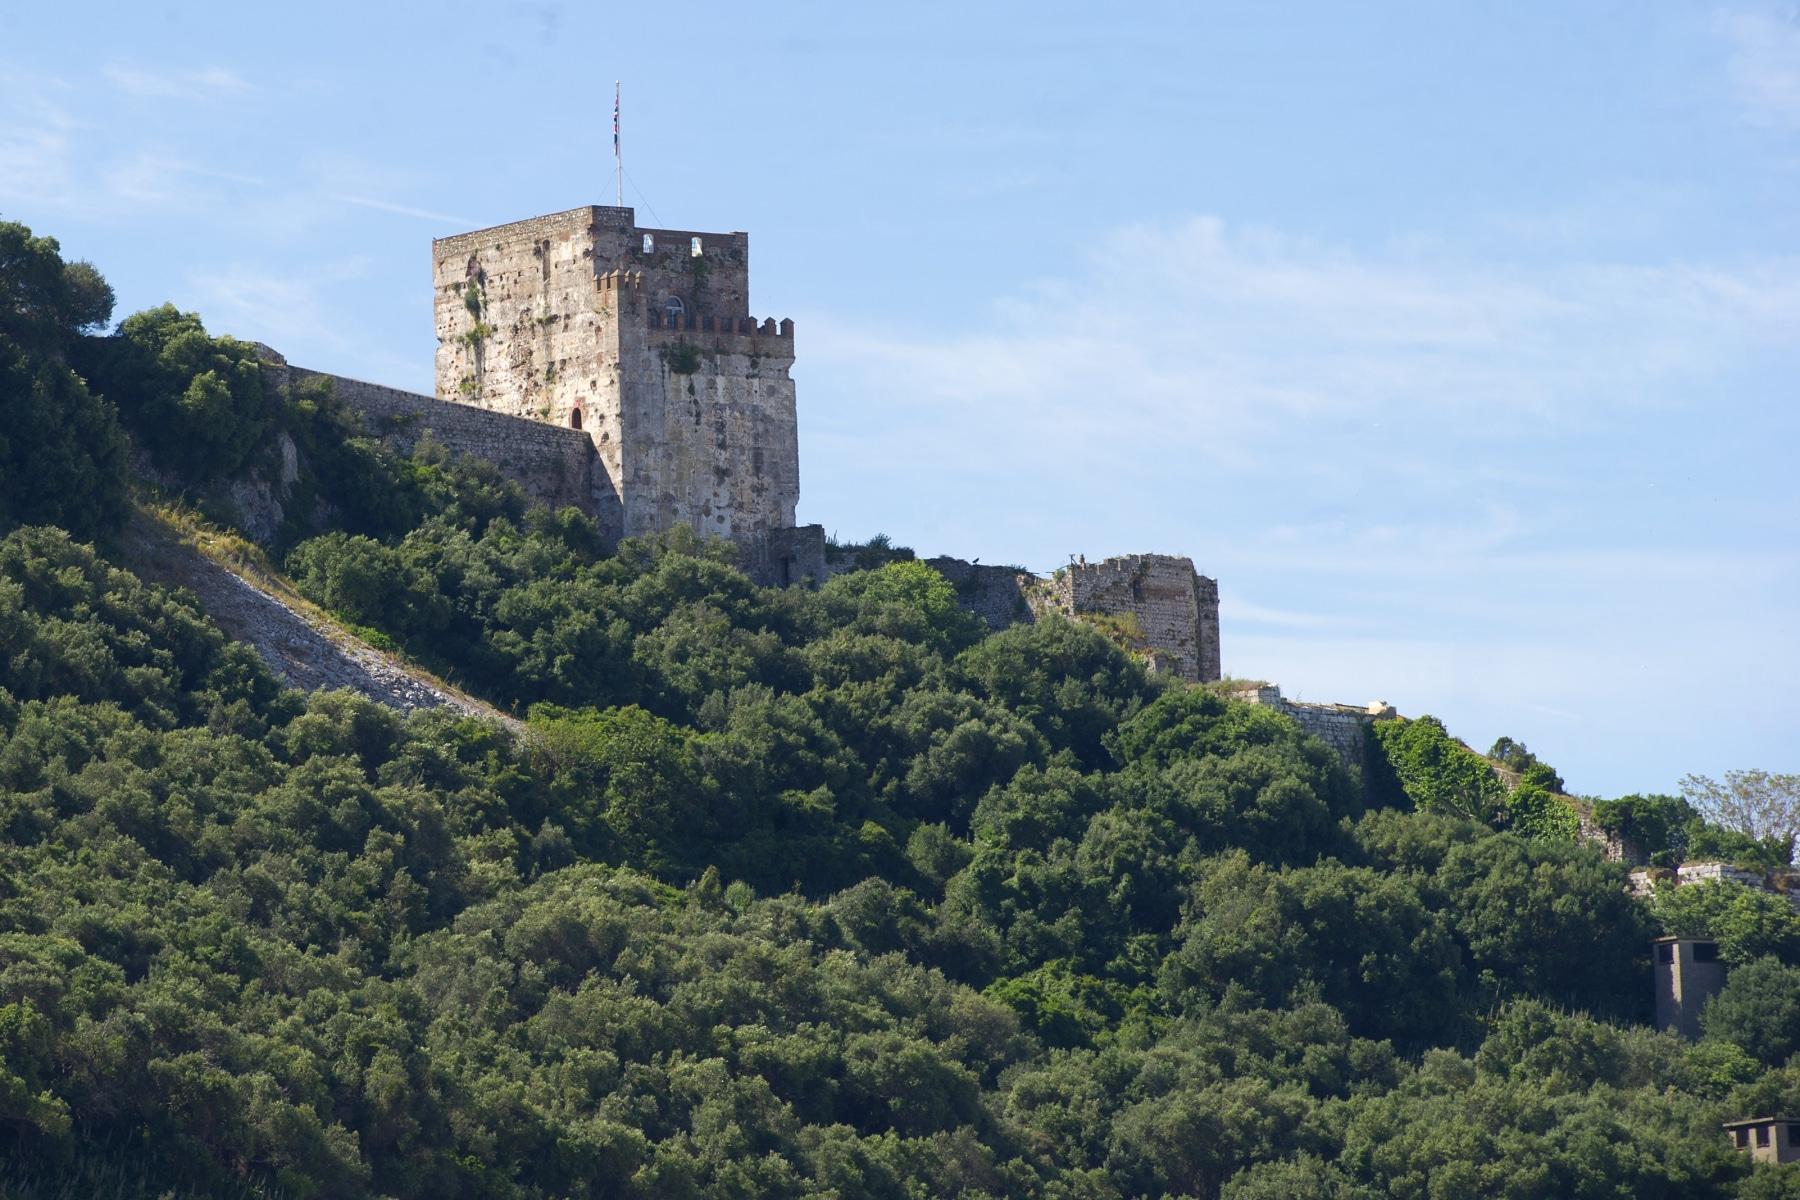 fortn-moro-gibraltar-_9225051012_o